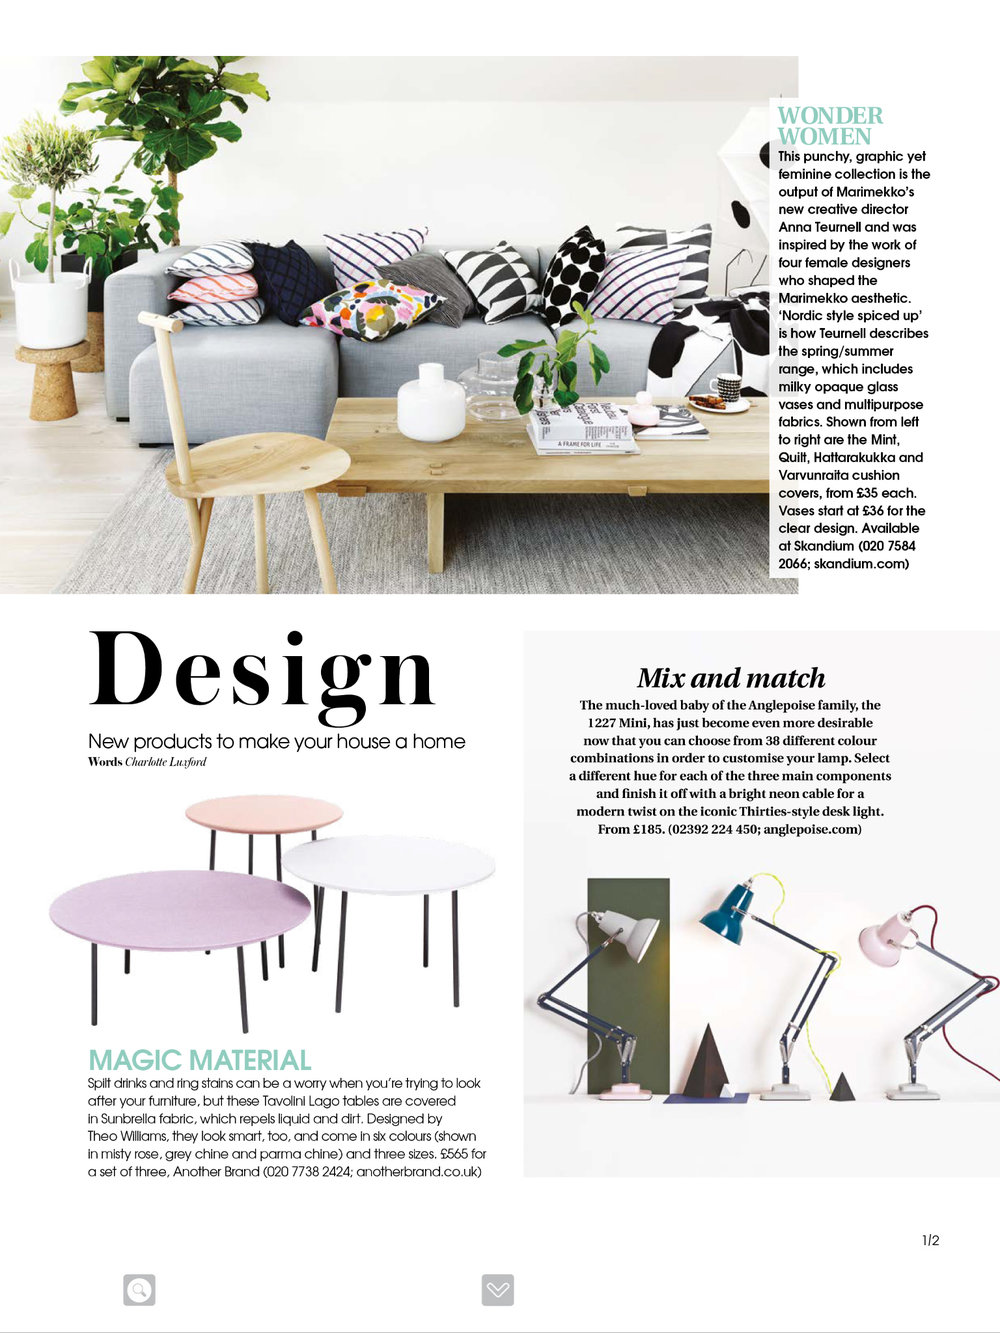 Grand Designs – Apr 16